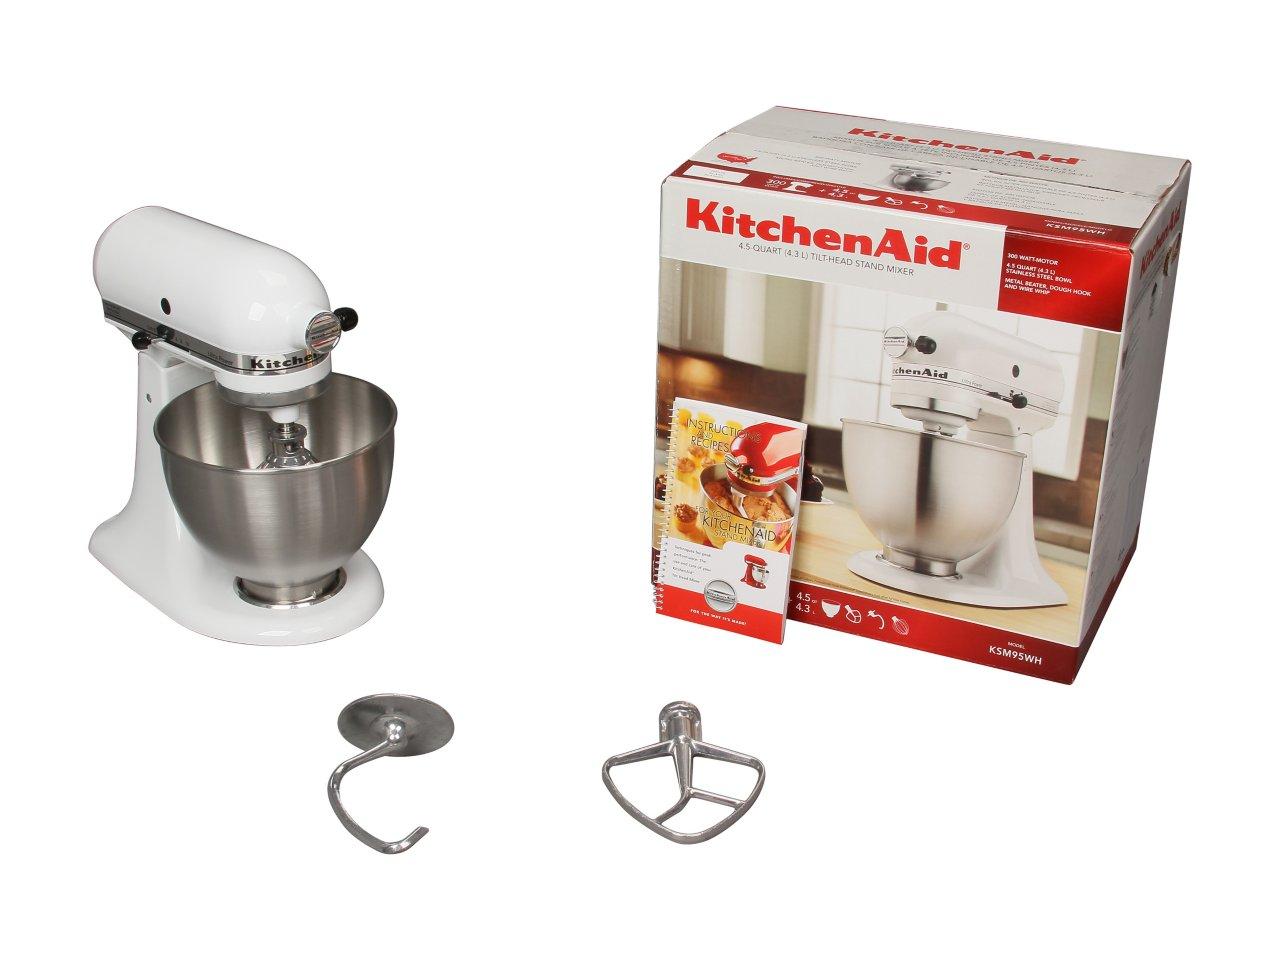 Kitchen aid ultra power mixer Photo - 9